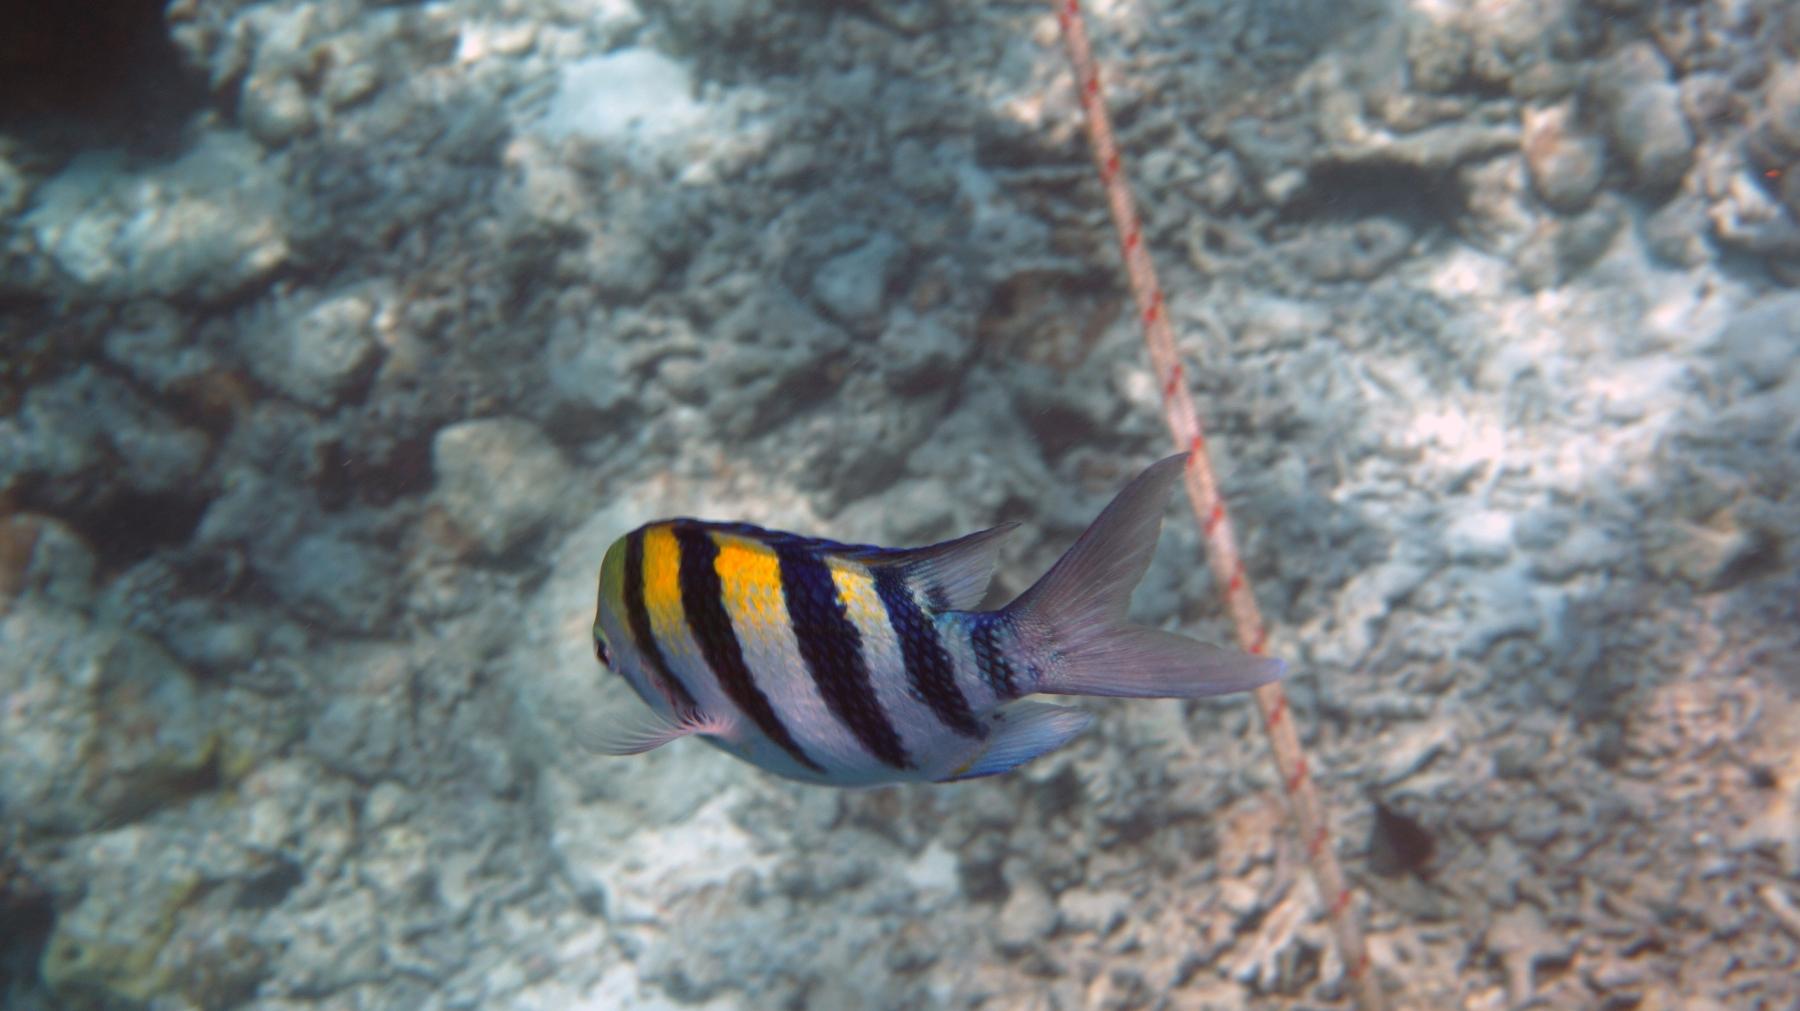 Abudefduf_vaigiensis_004_C_Damiselas-Peces-Payaso_L_Maldivas_U_Sebas_30062015